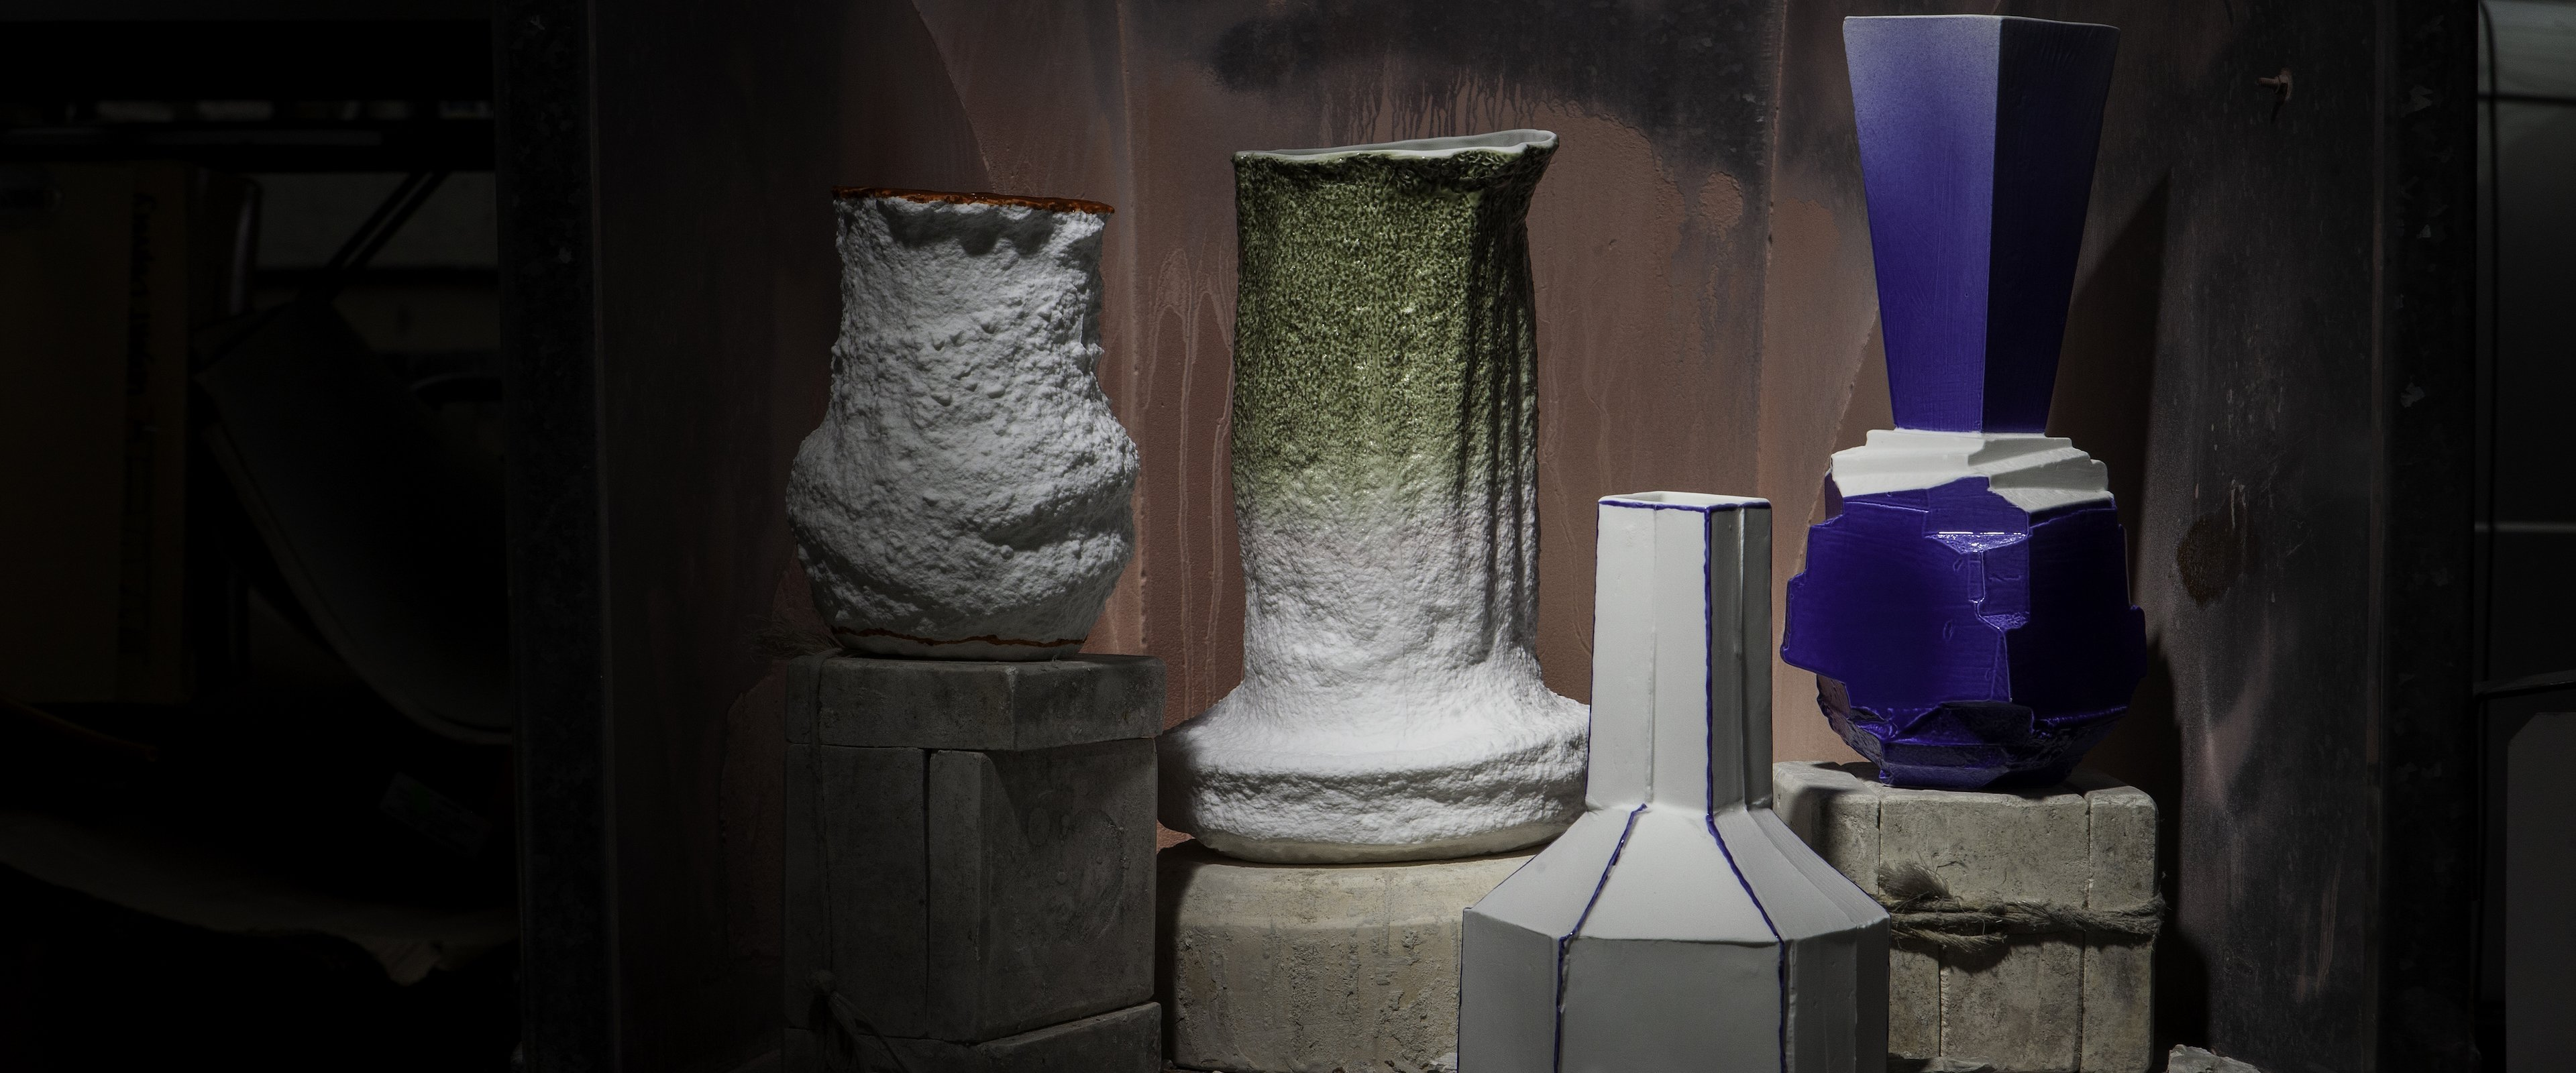 Stegreif Vase Collection with Johannes Nagel | 1882 Ltd.